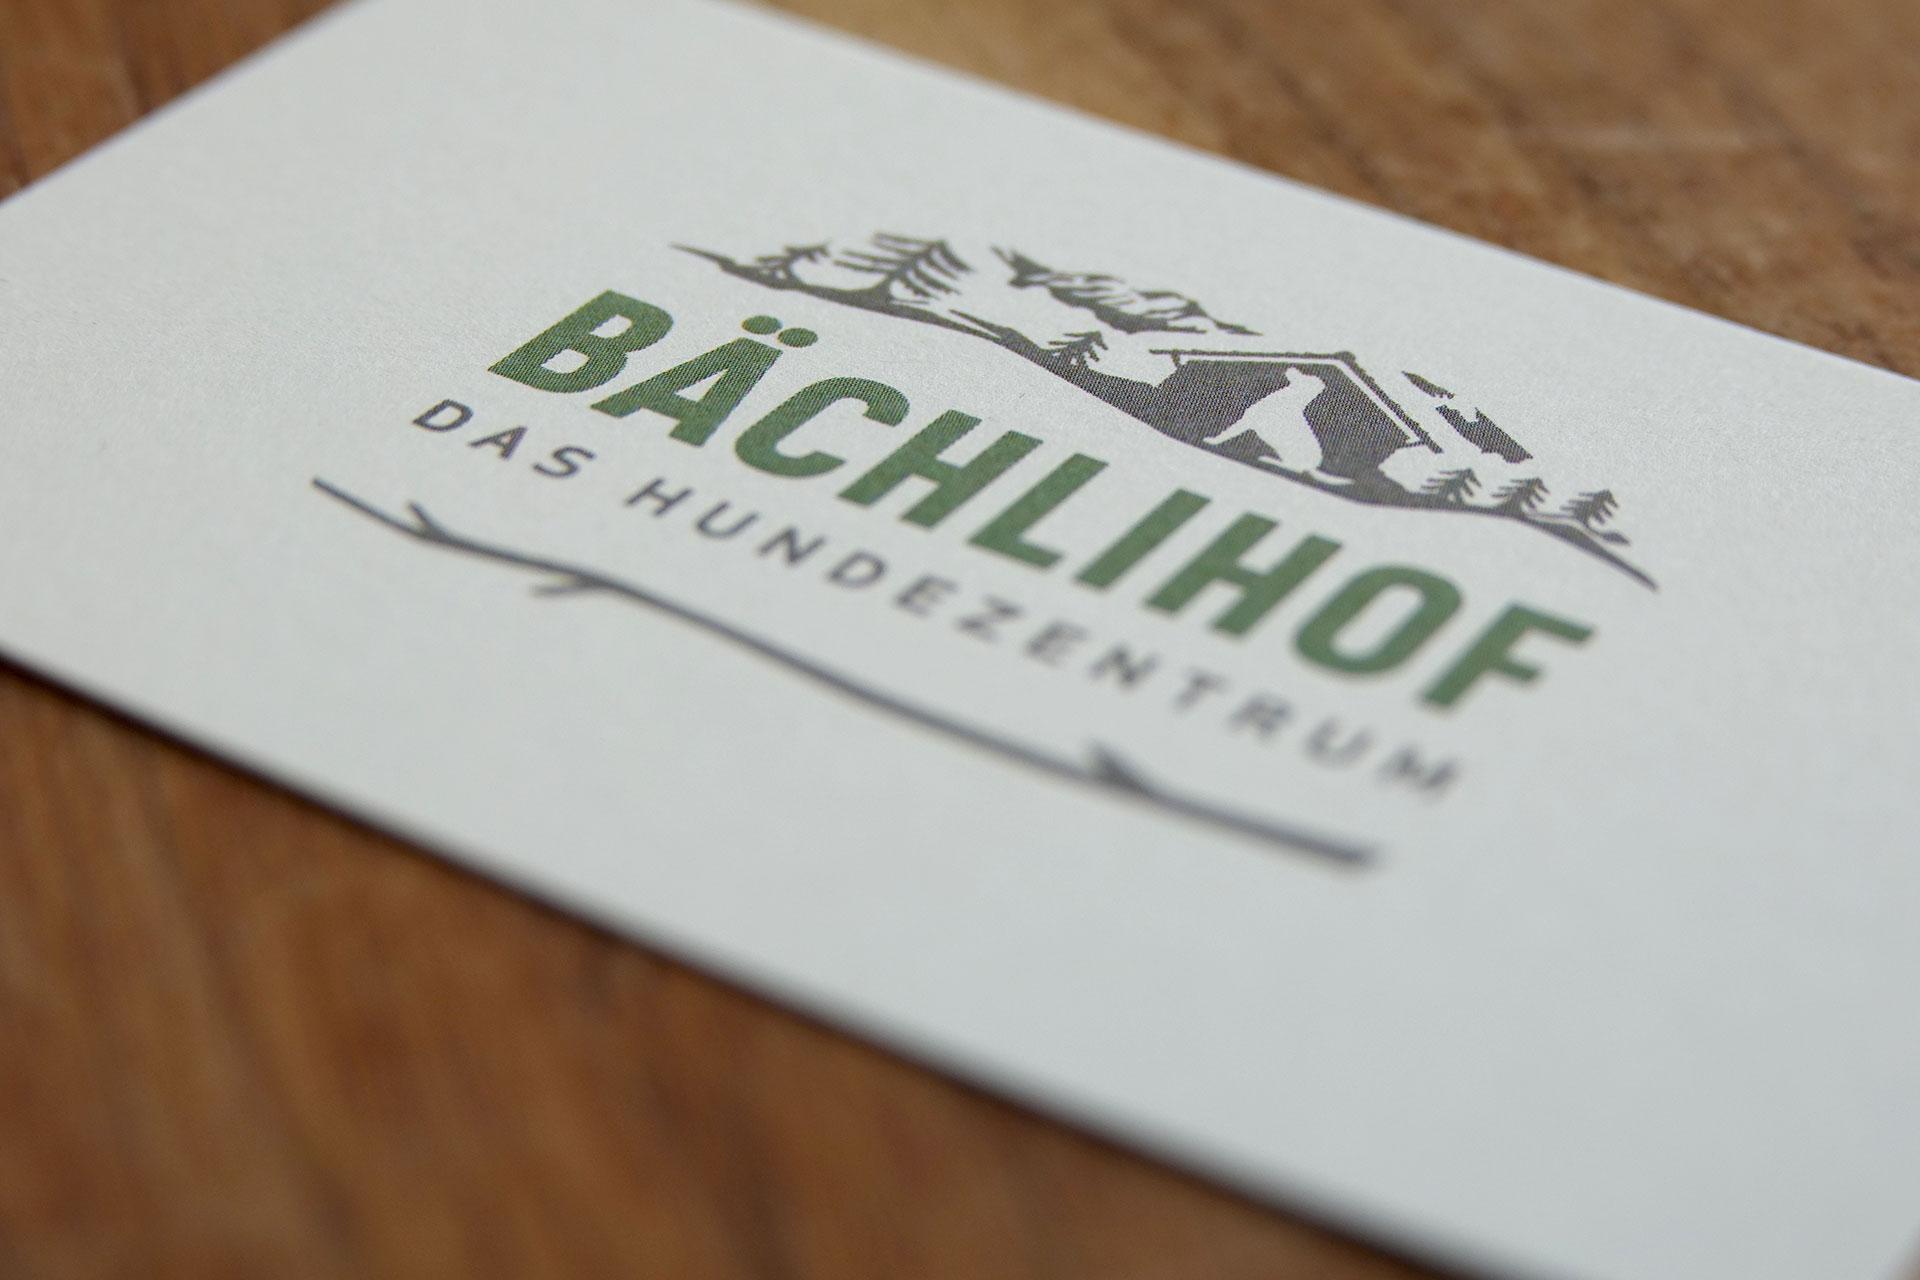 Baechlihof_Hundezentrum_Visitenkarte.jpg